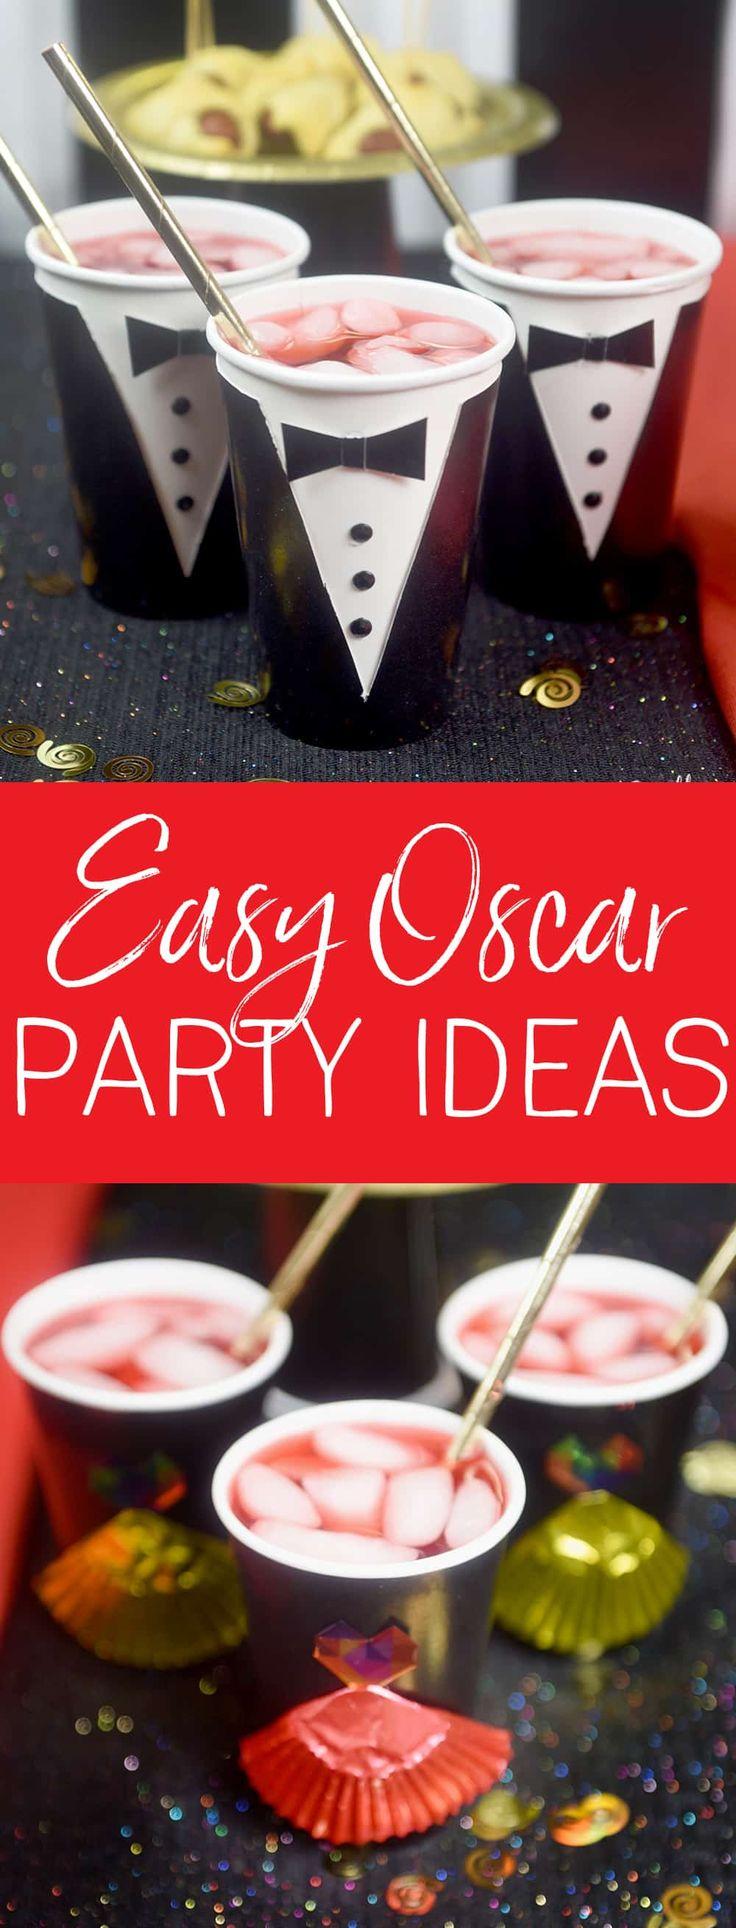 Birthday gift bags 5 cooking for oscar - 5 Easy Oscar Party Ideas